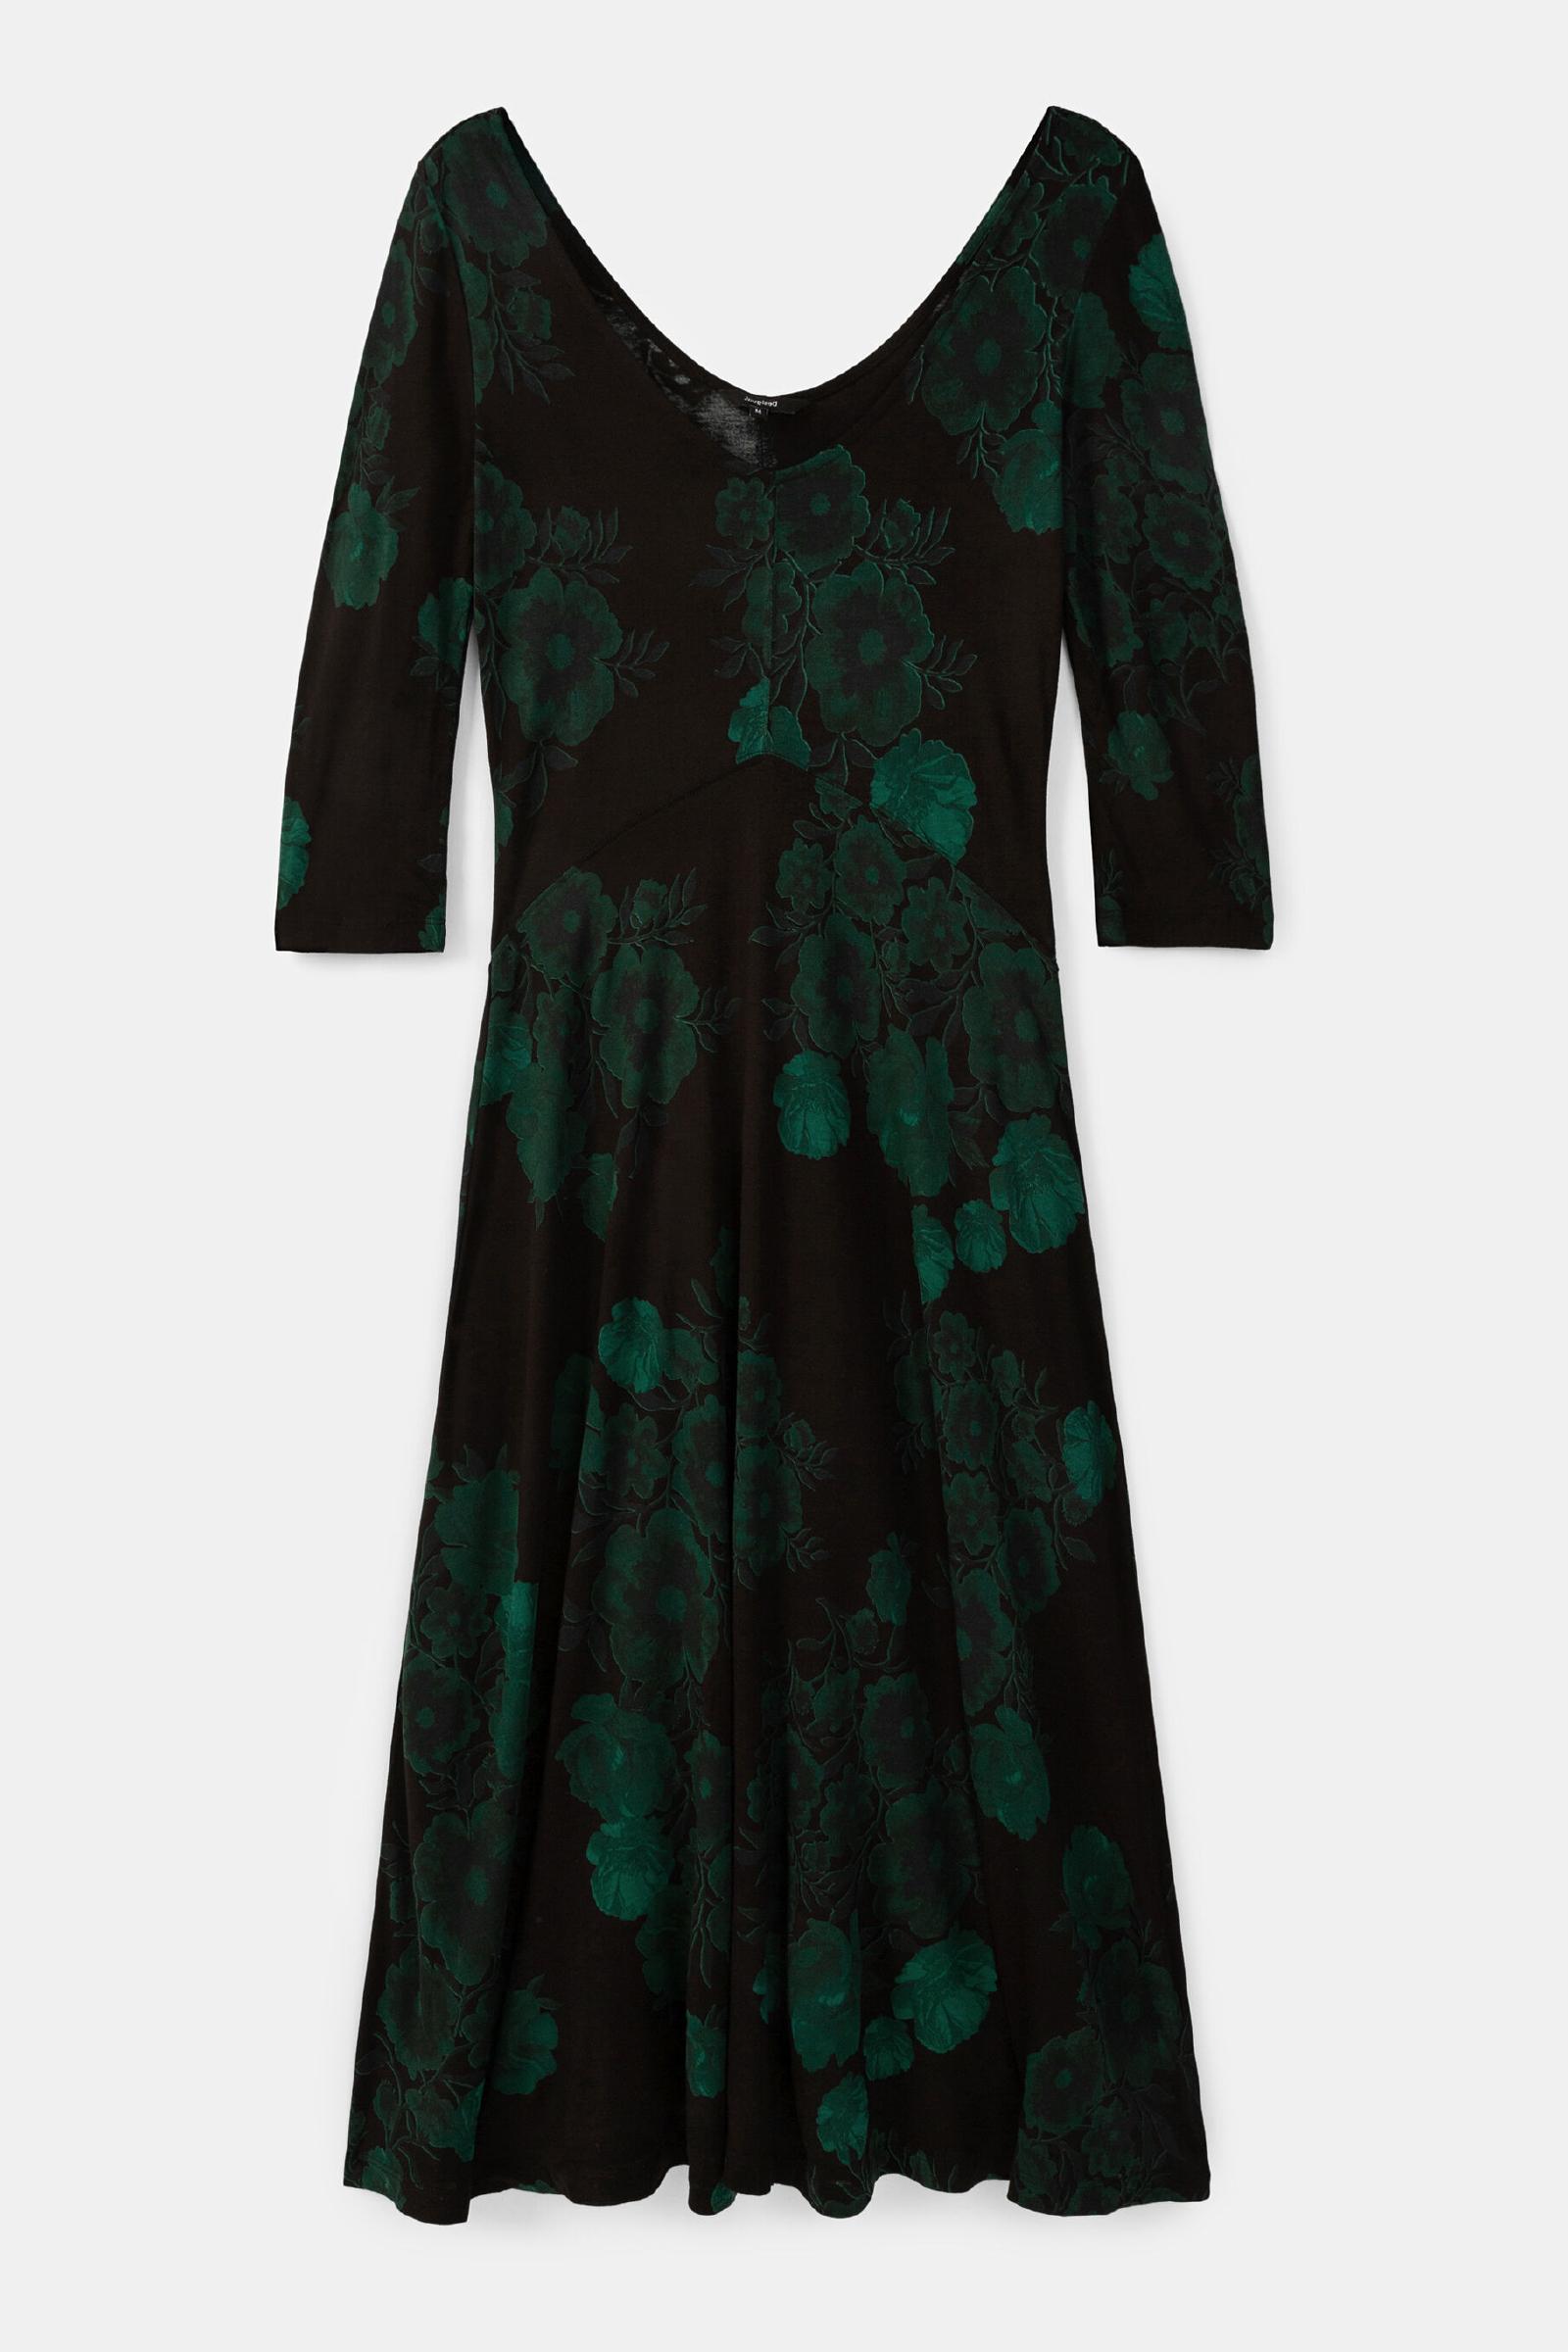 DESIGUAL Dress Woman Model YESS DESIGUAL   Dress   20WWVK144009